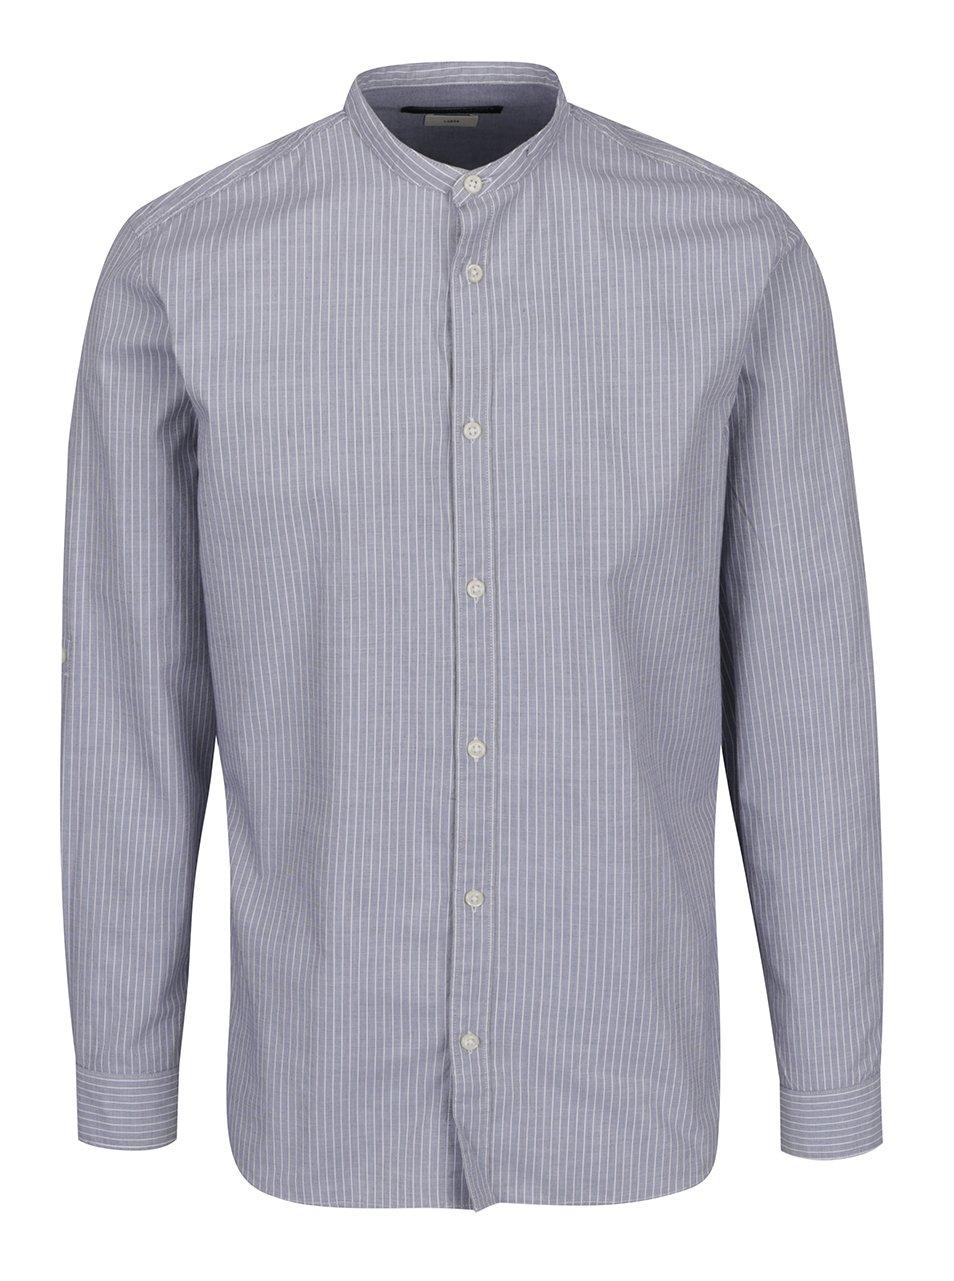 Šedá pruhovaná slim fit košile Jack & Jones Premium Sao Paulo